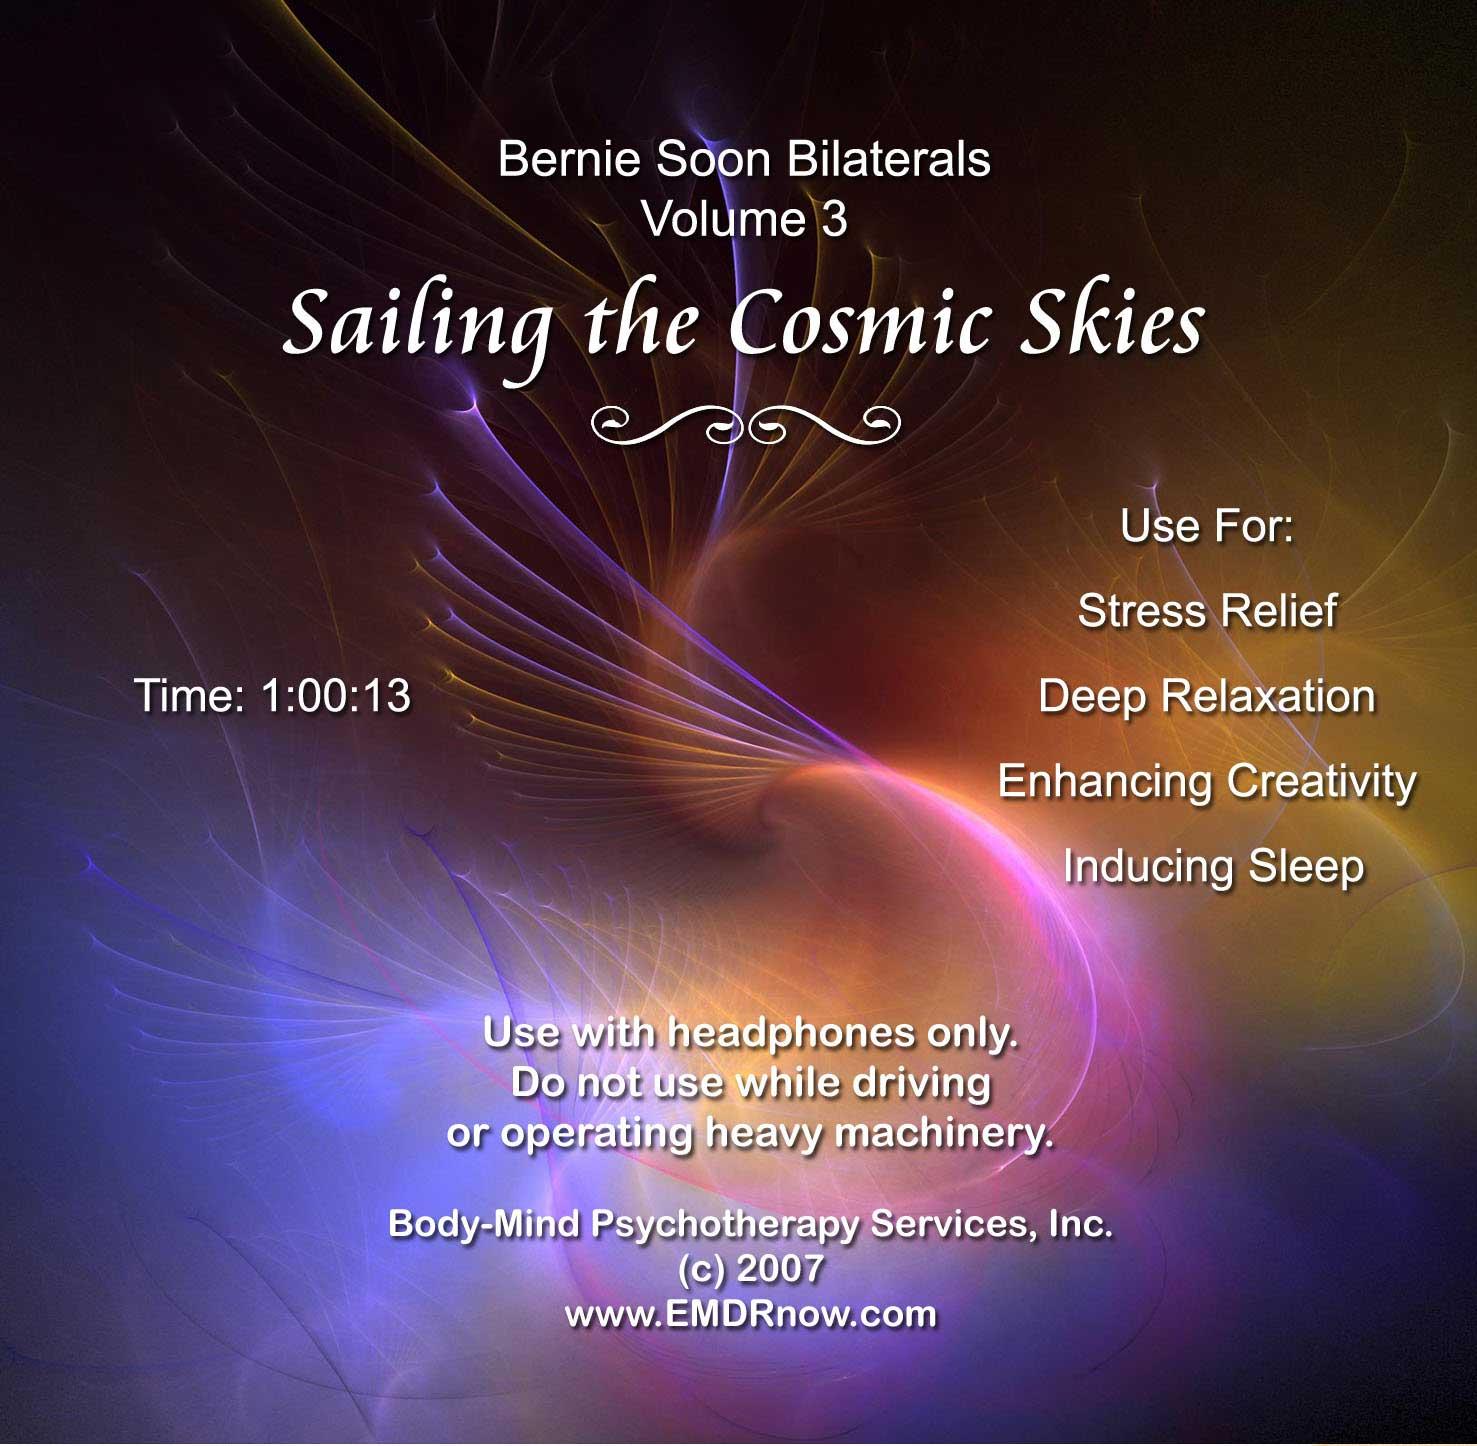 EMDR_Bilateral_CD_Vol3_Cosmic_Skies